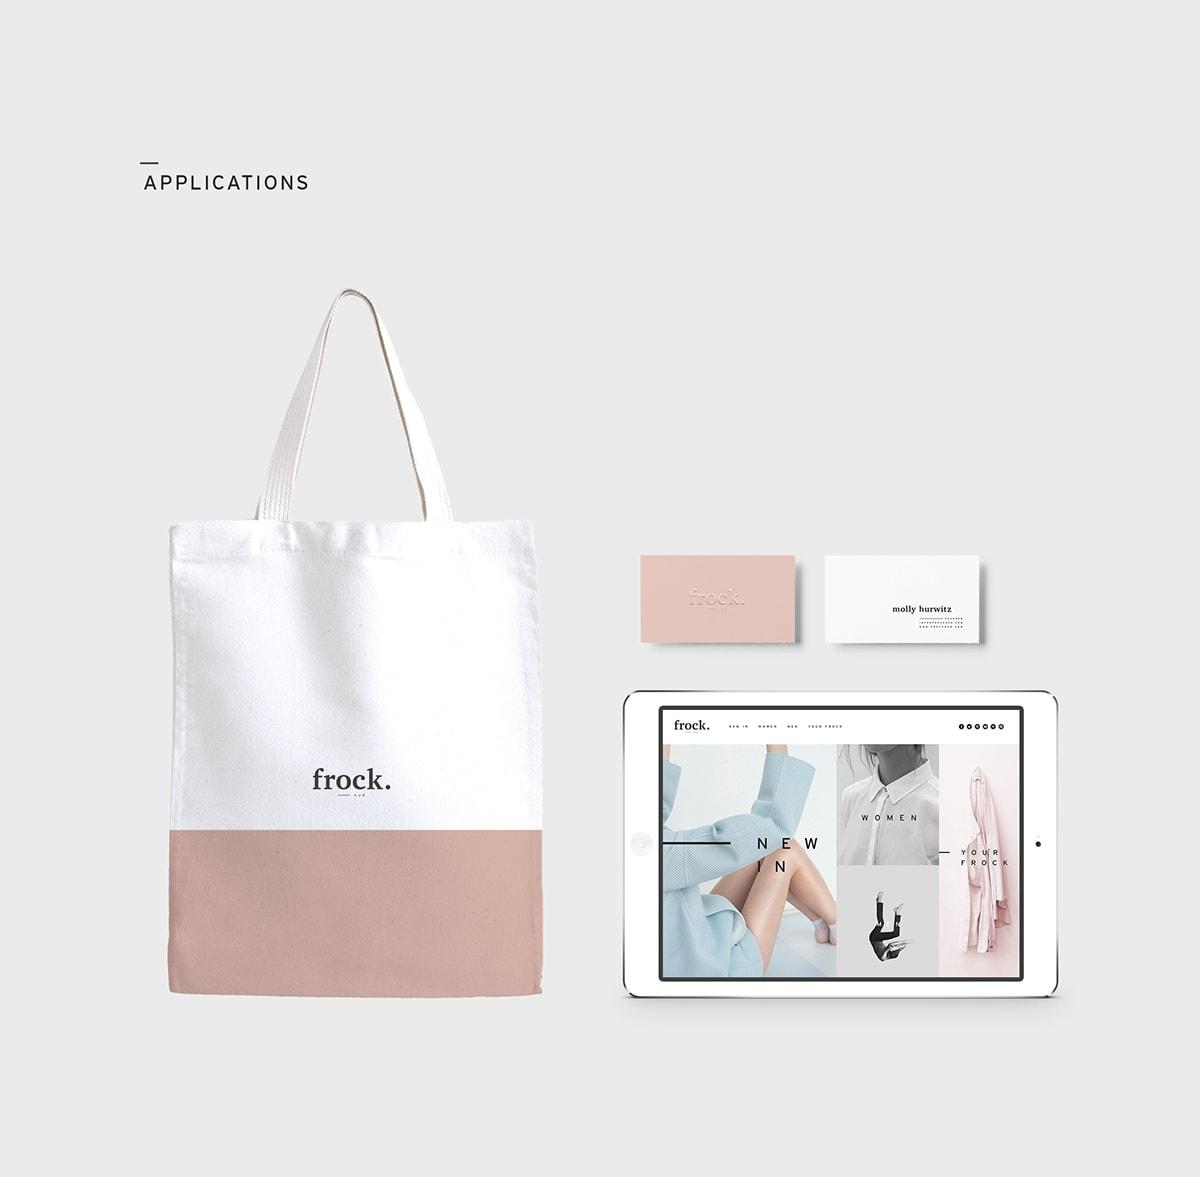 Brand-Identity-Design-Frock